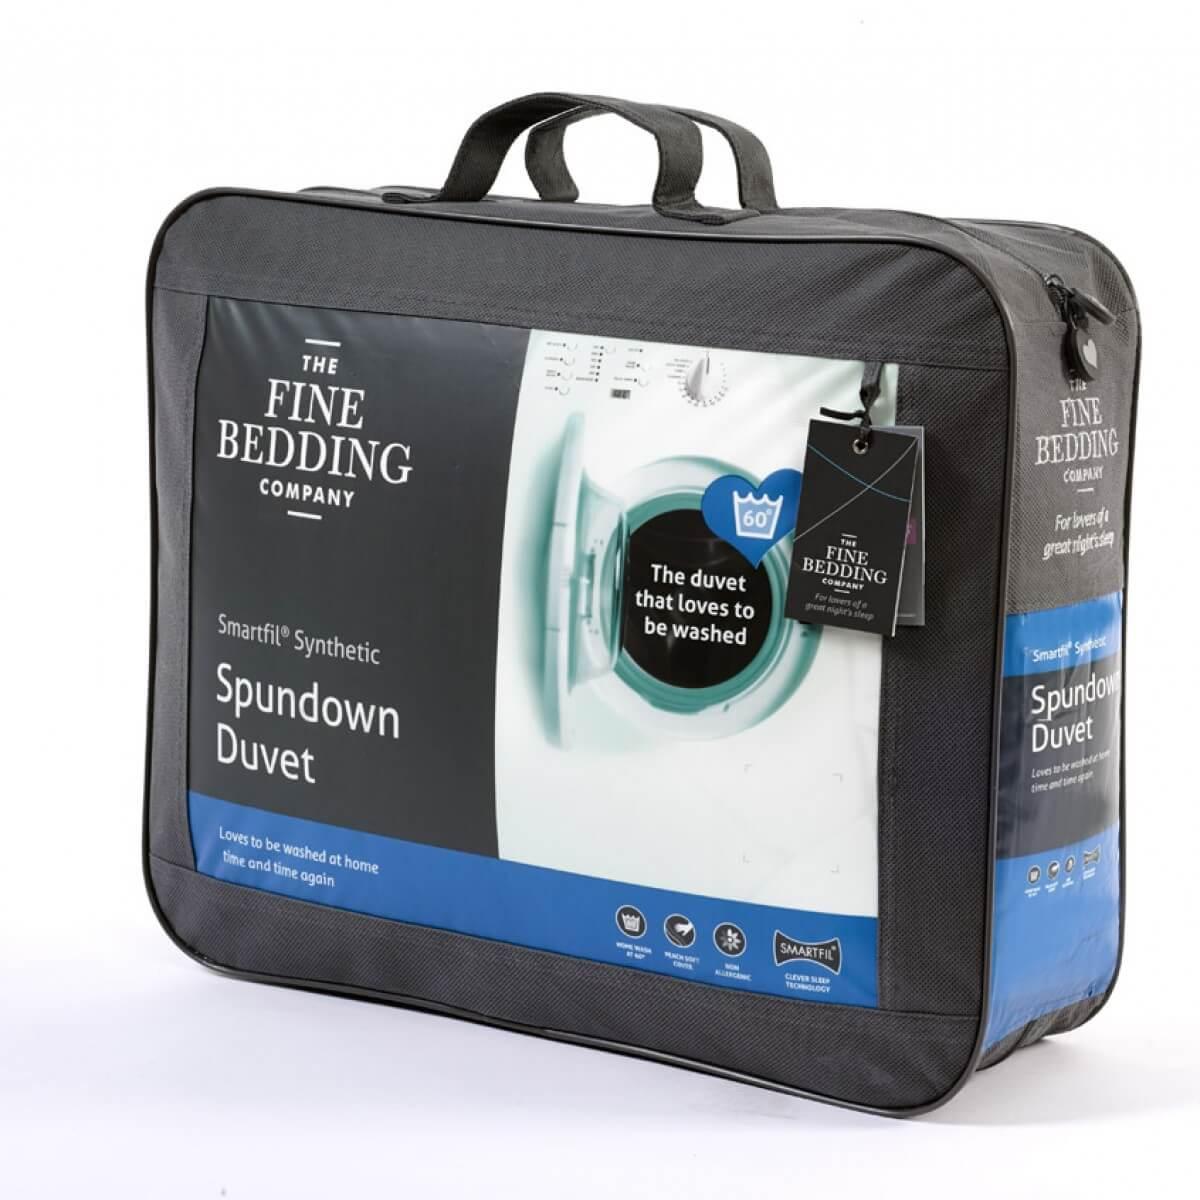 Spundown Duvet - The Fine Bedding Company